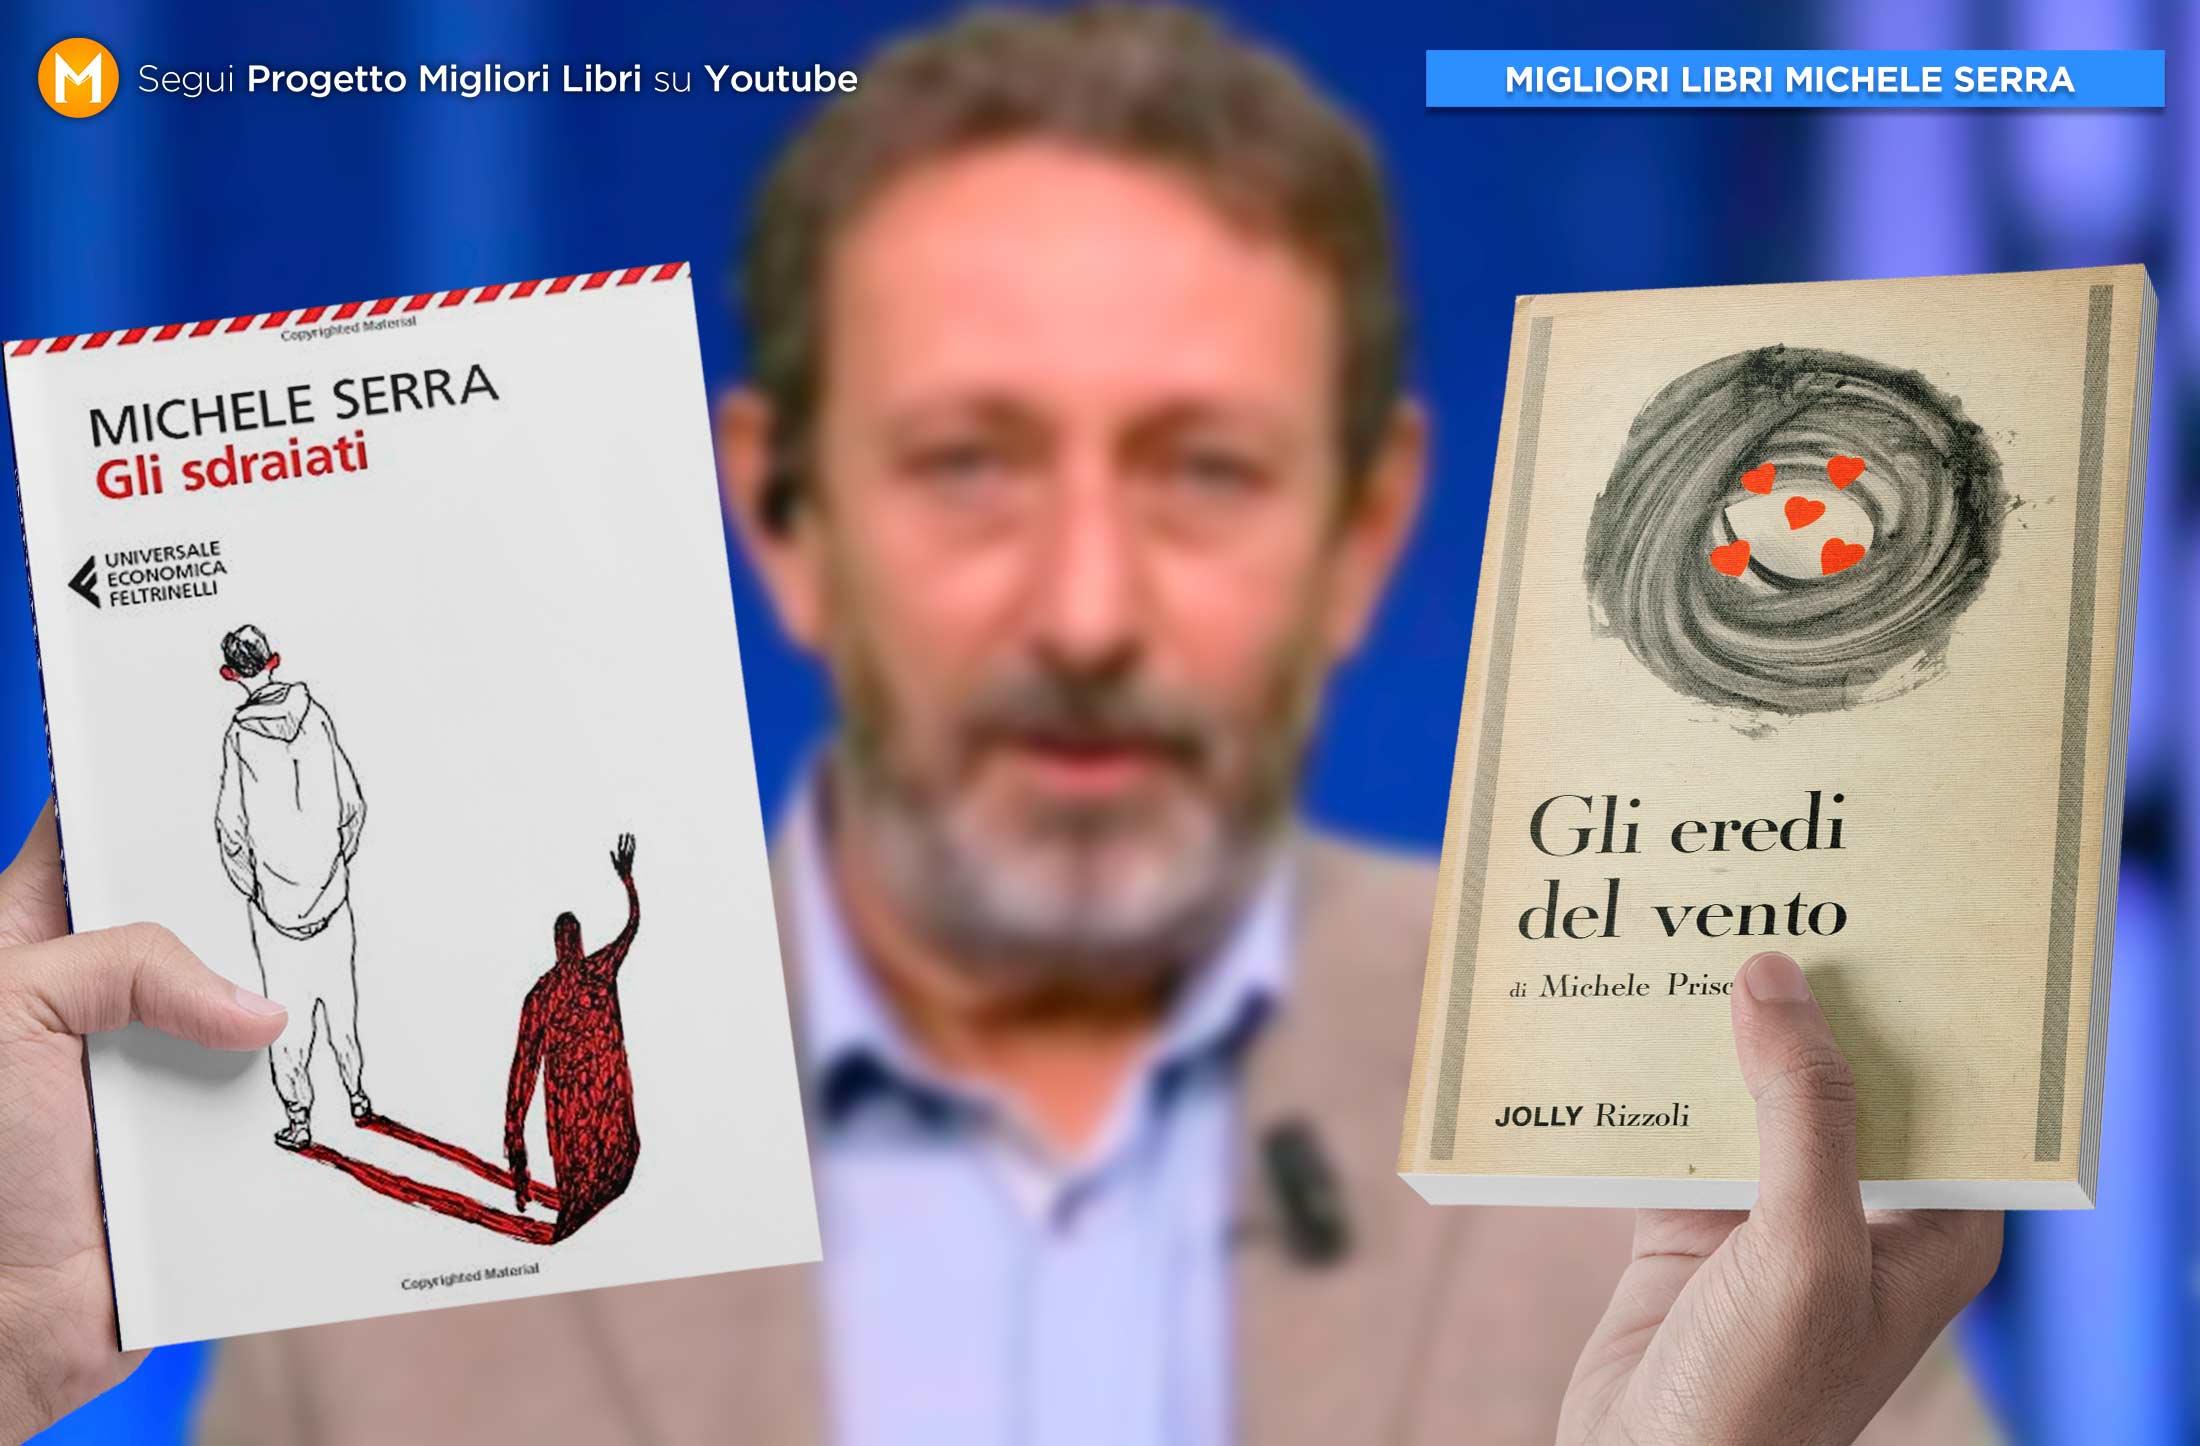 migliori-libri-michele-serra